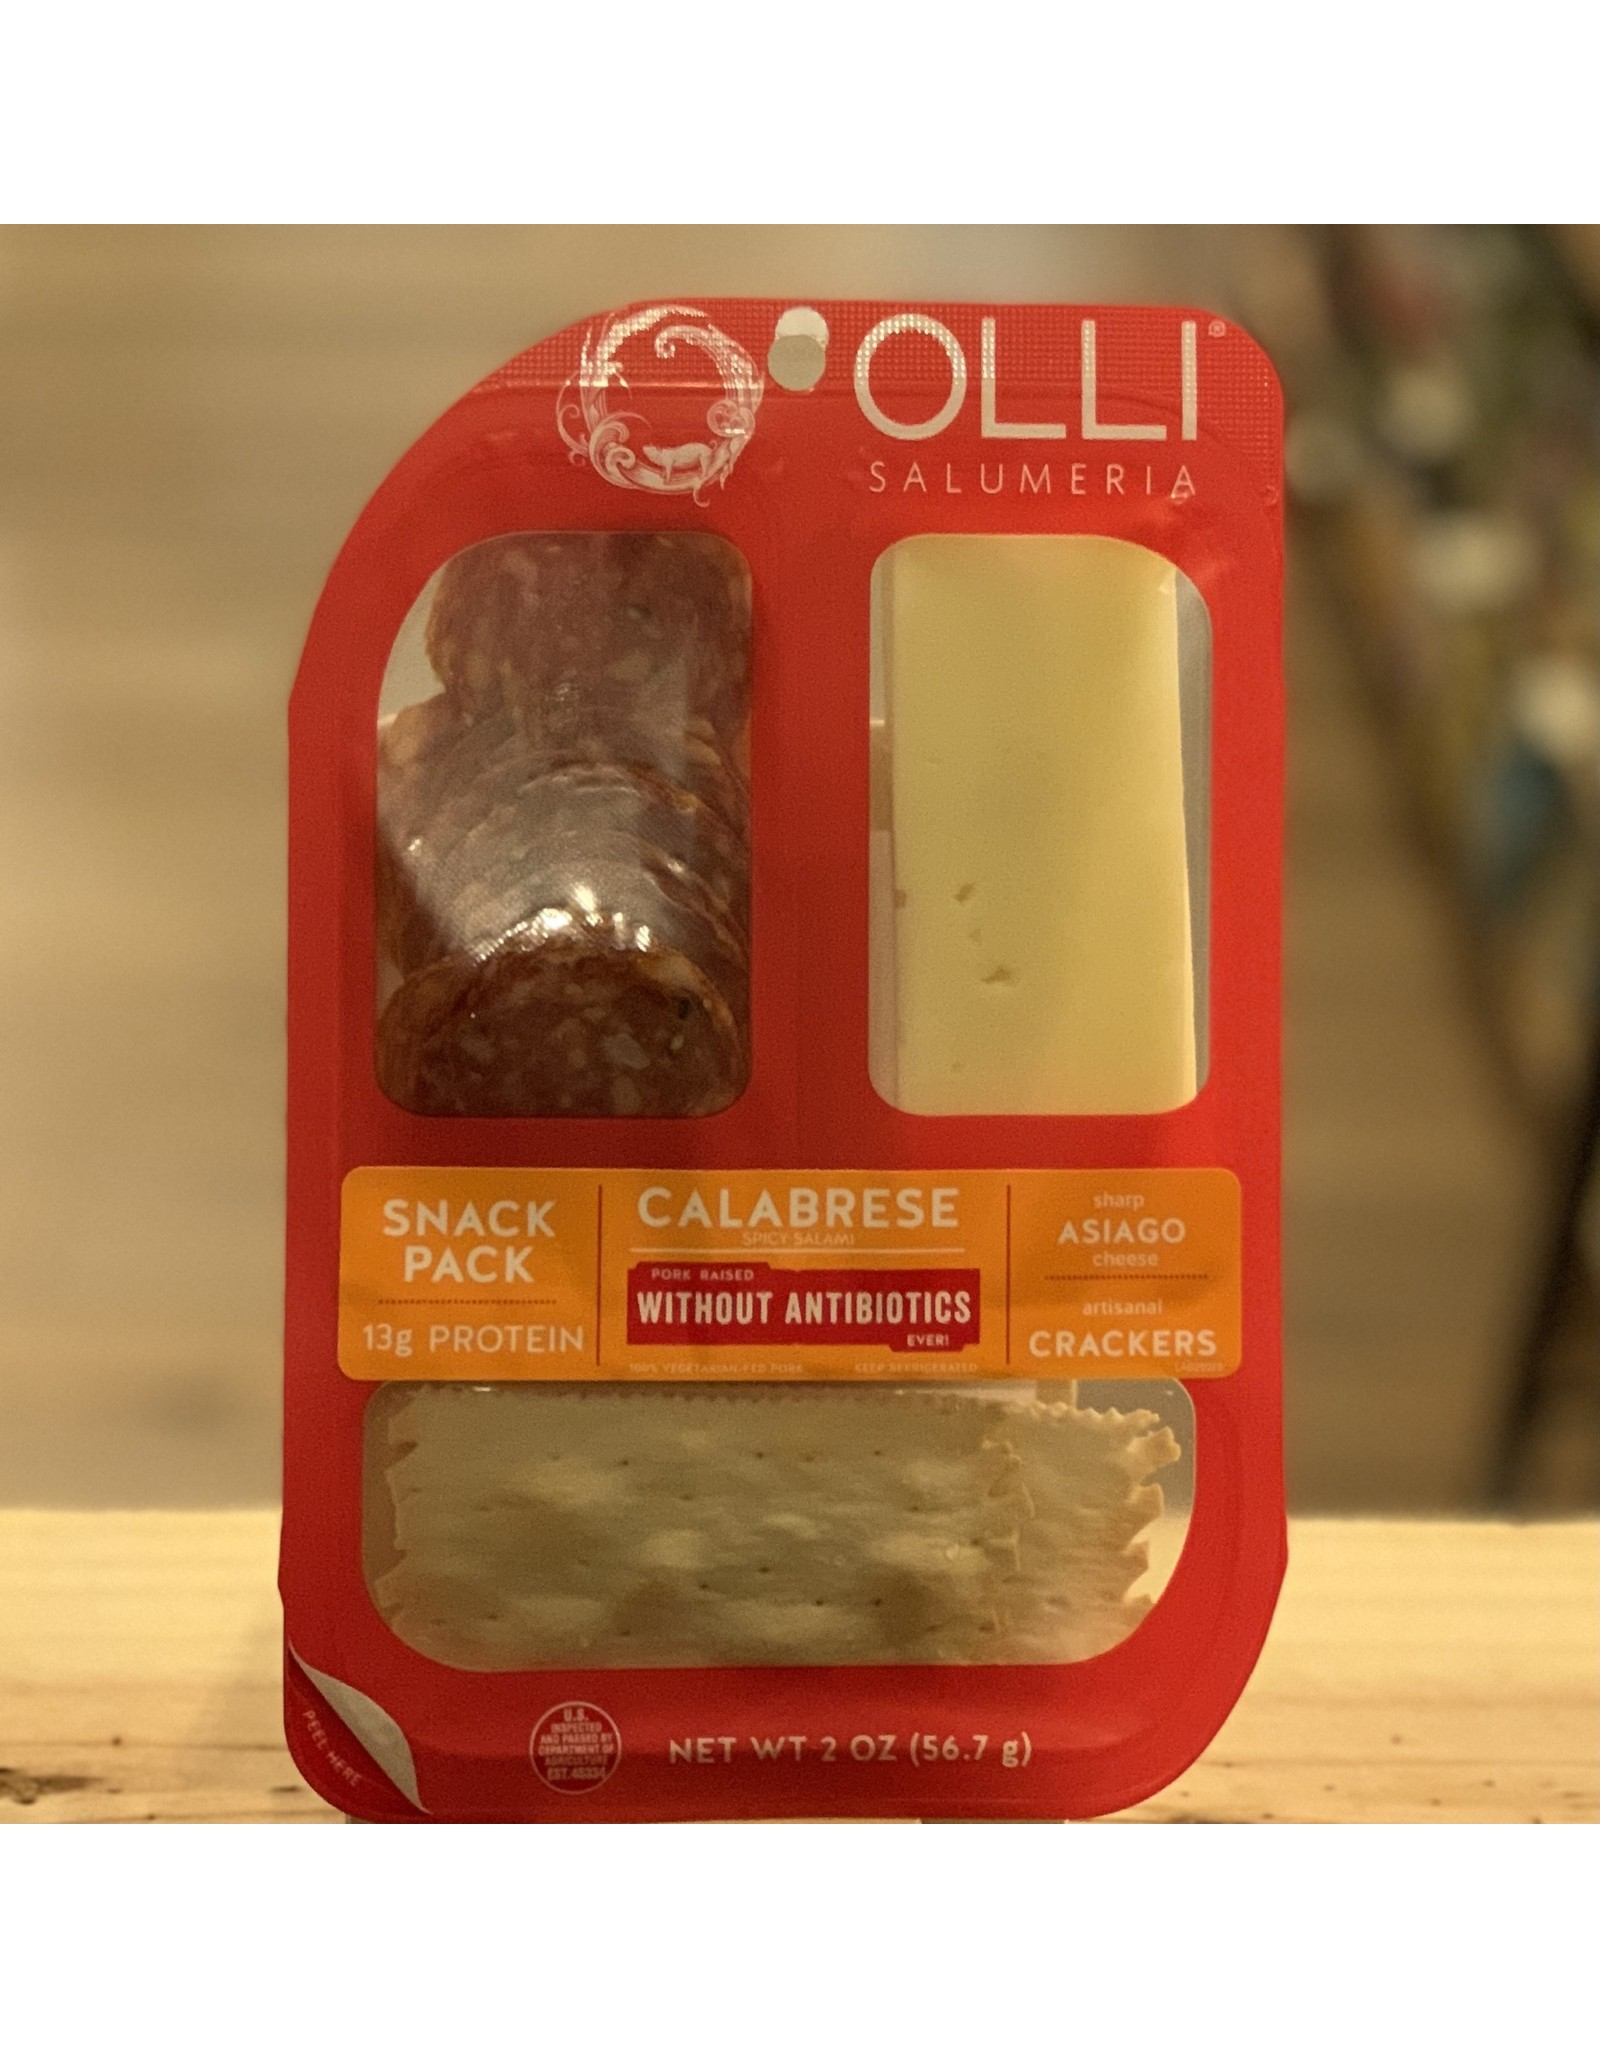 Olli Salumeri Snack Pack w/Calabrese, Asiago and Crackers - Oceanside, CA